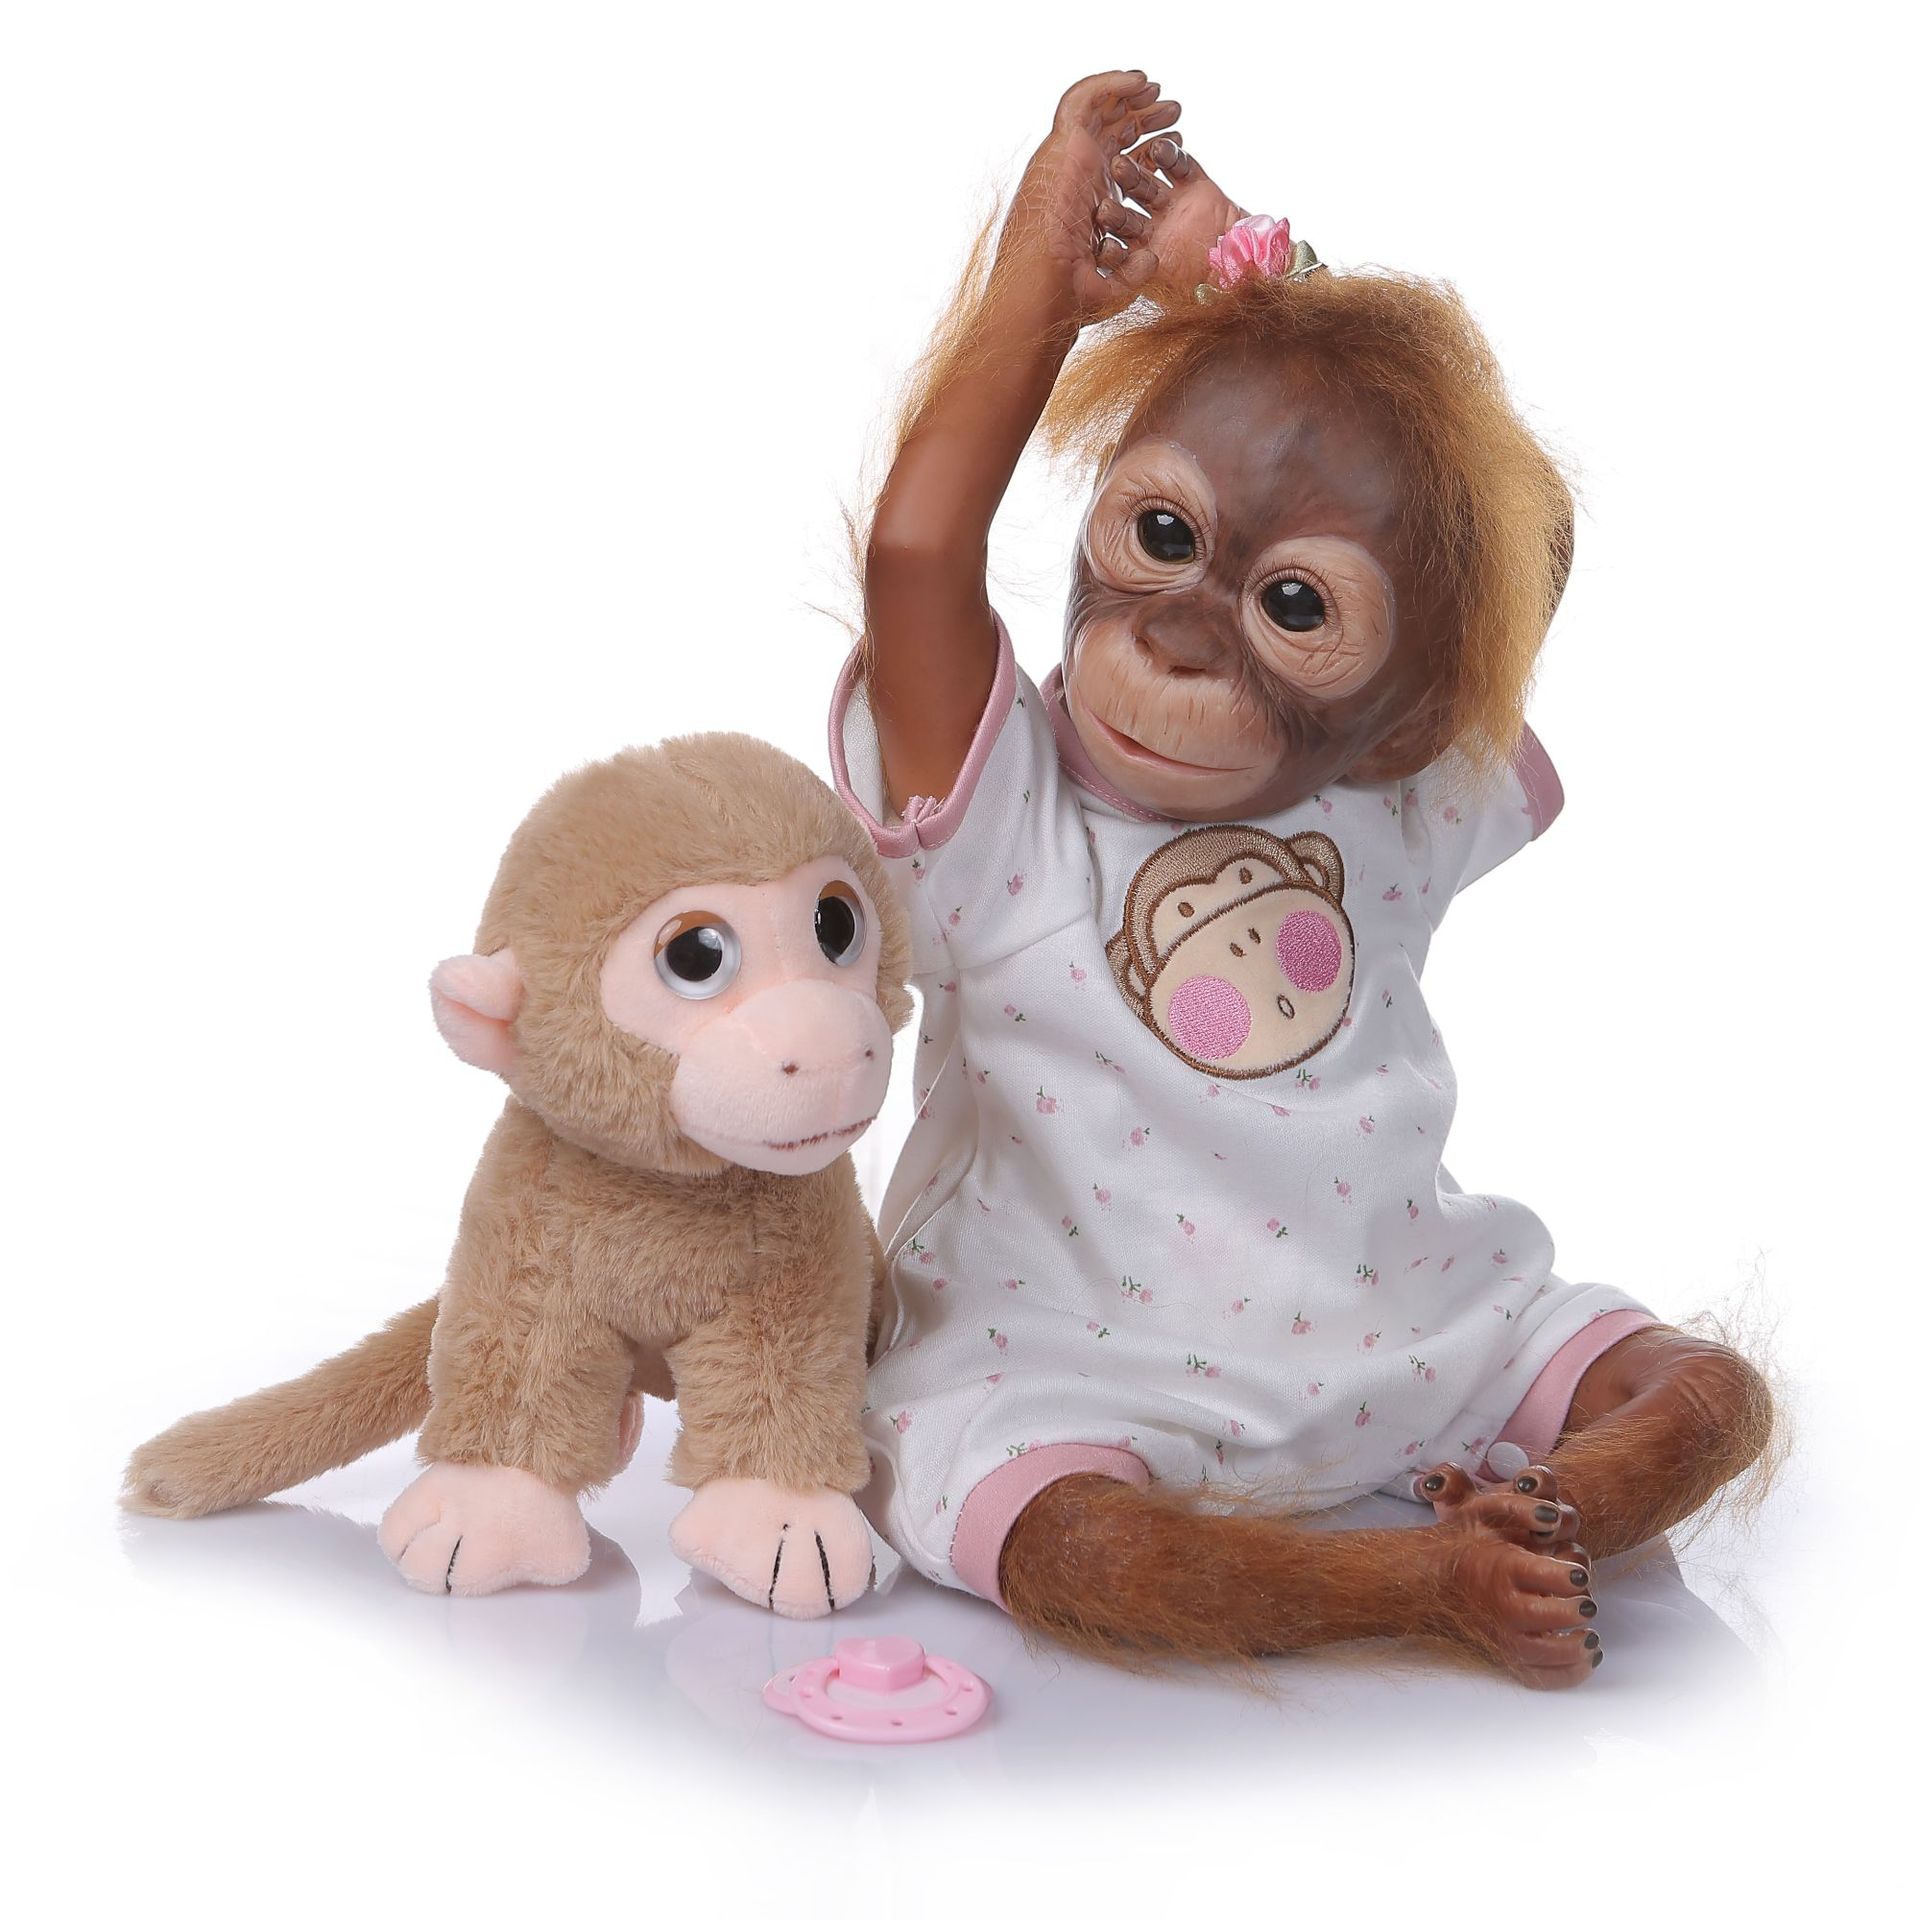 Children Creative Gift Cute Monkey Accompany Toy Realistic Monkey Doll